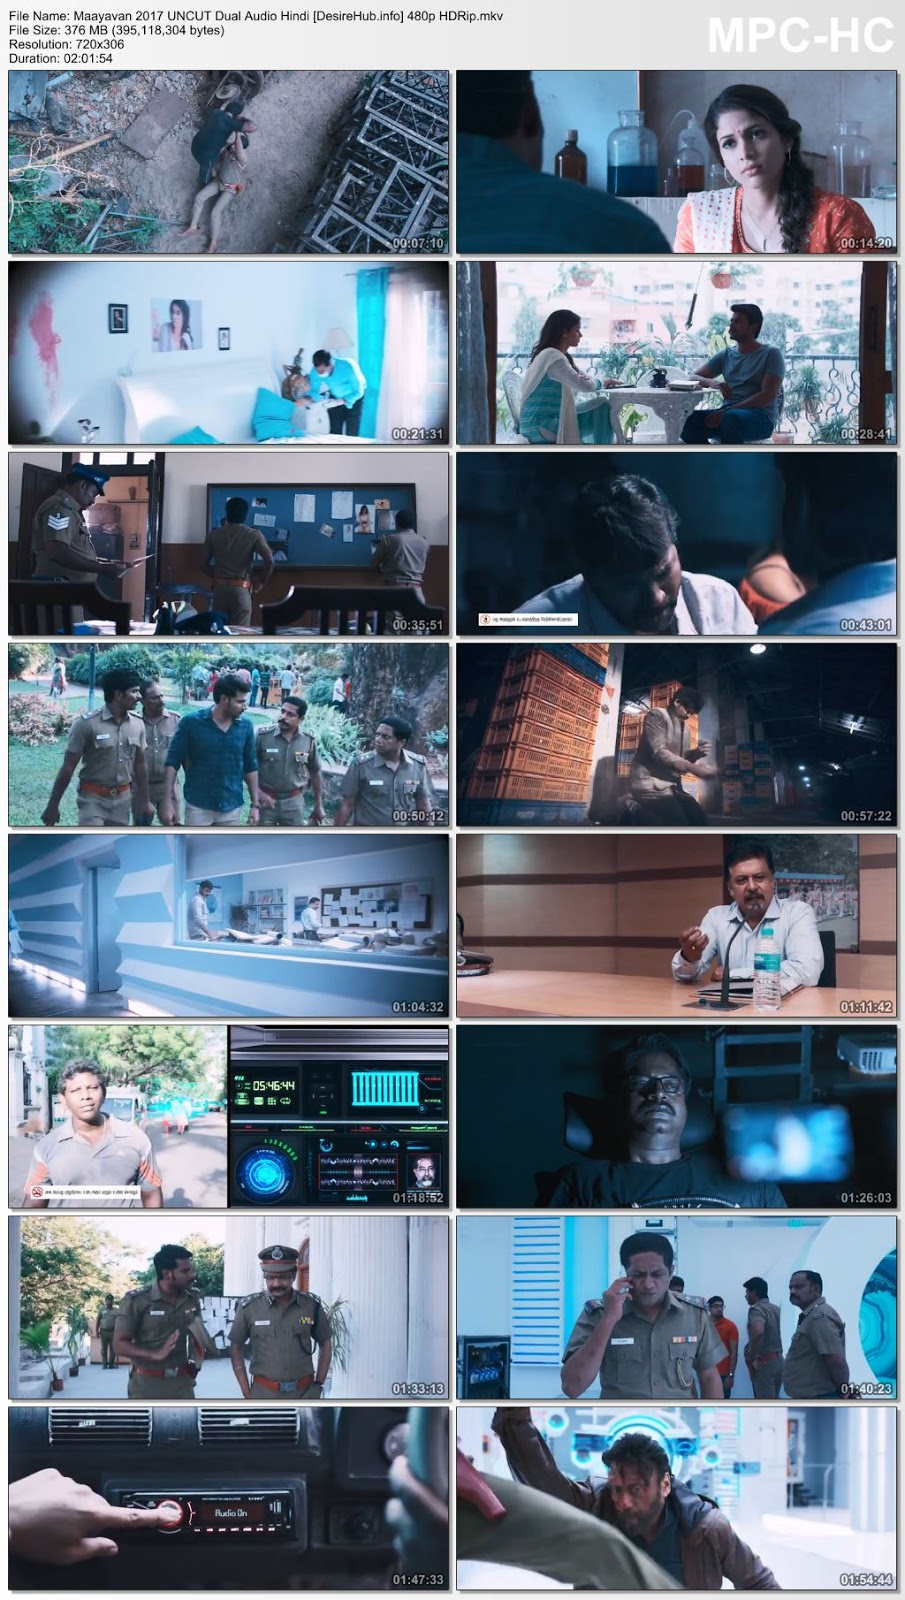 Maayavan 2017 UNCUT Dual Audio Hindi 480p HDRip 350MB Desirehub